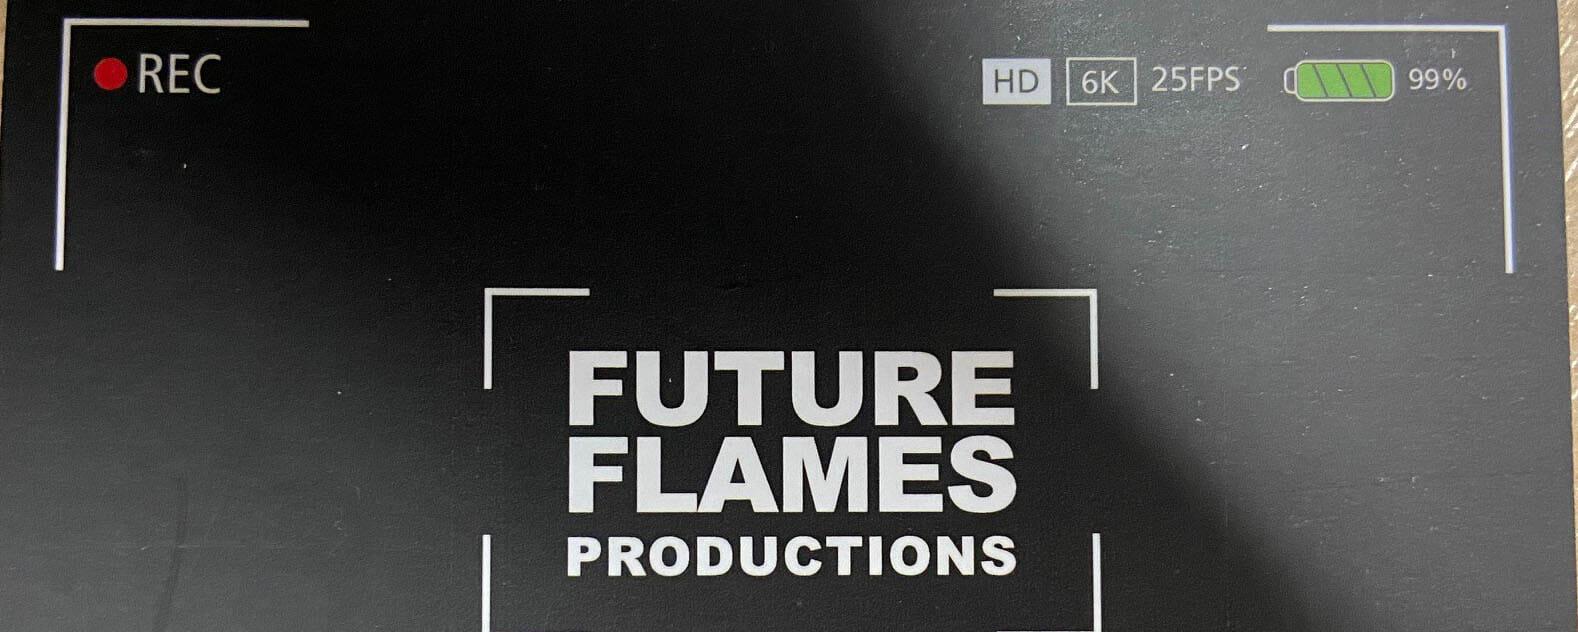 Future Flames business card web